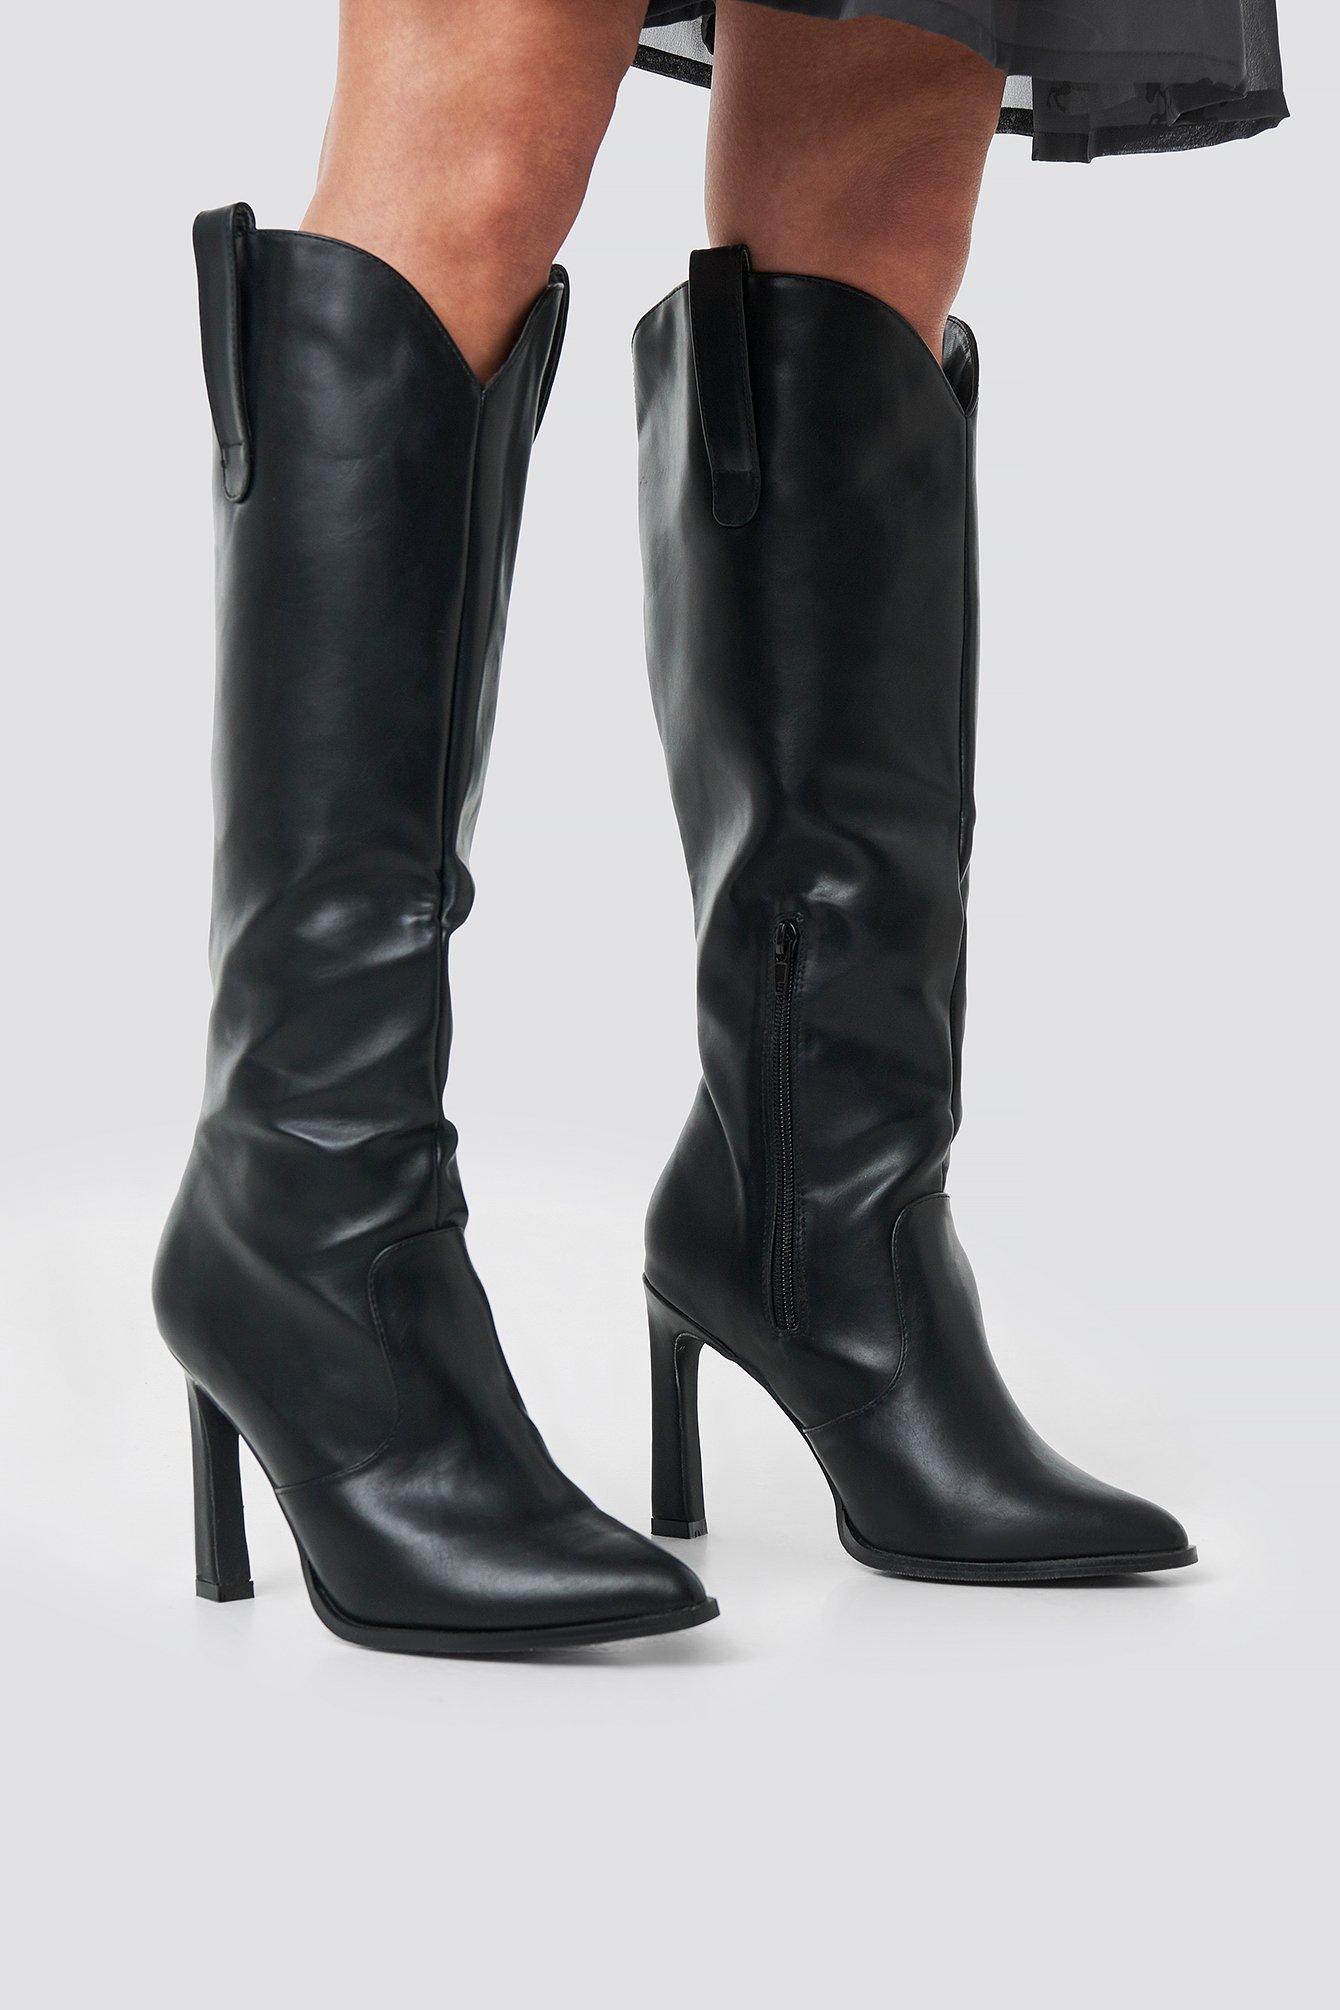 na-kd shoes -  Calf High Cowboy Boots - Black